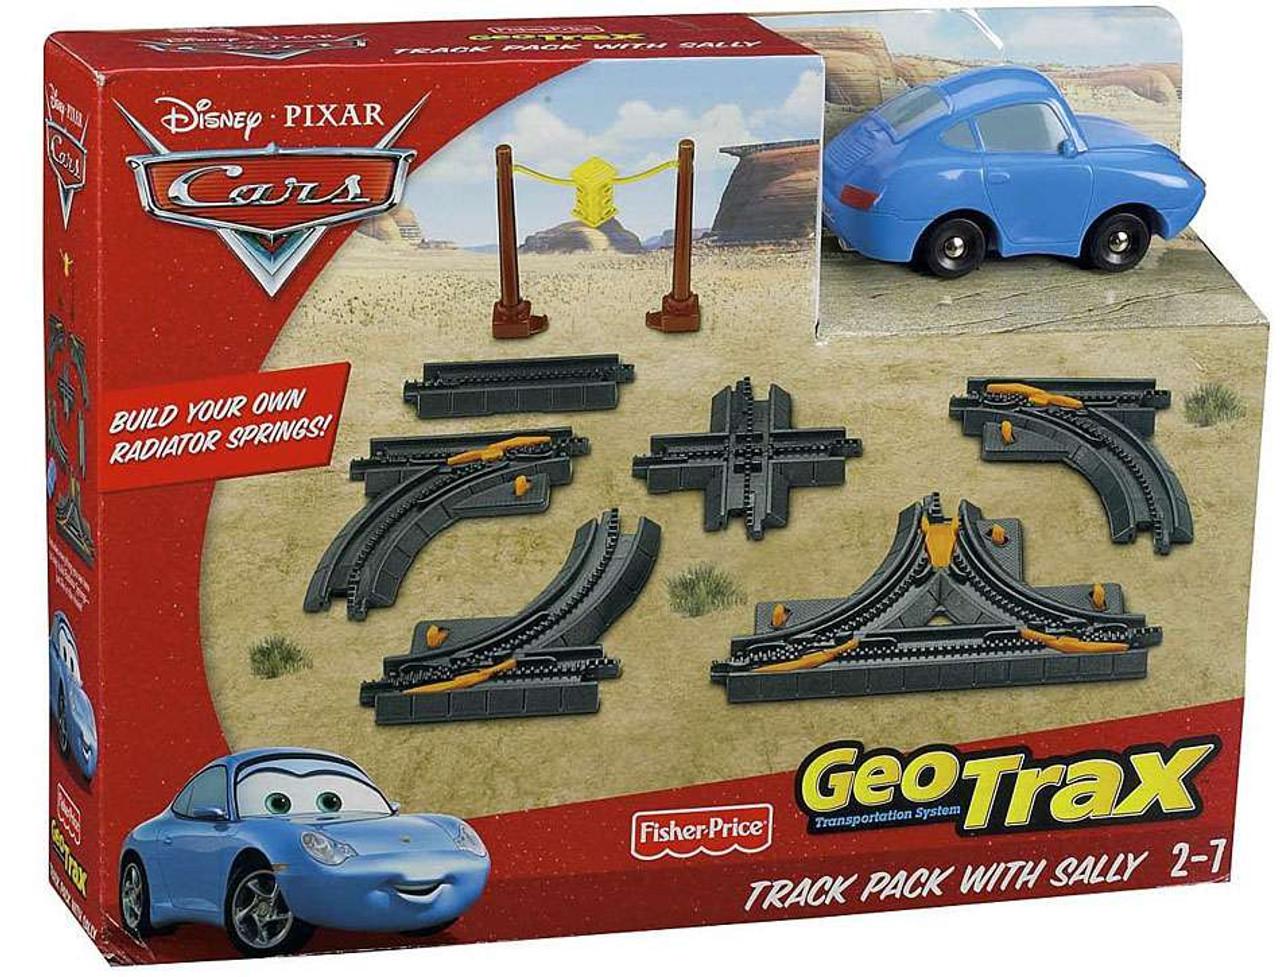 Fisher Price Disney Pixar Cars Geotrax Track Pack With Sally Geotrax Playset Toywiz